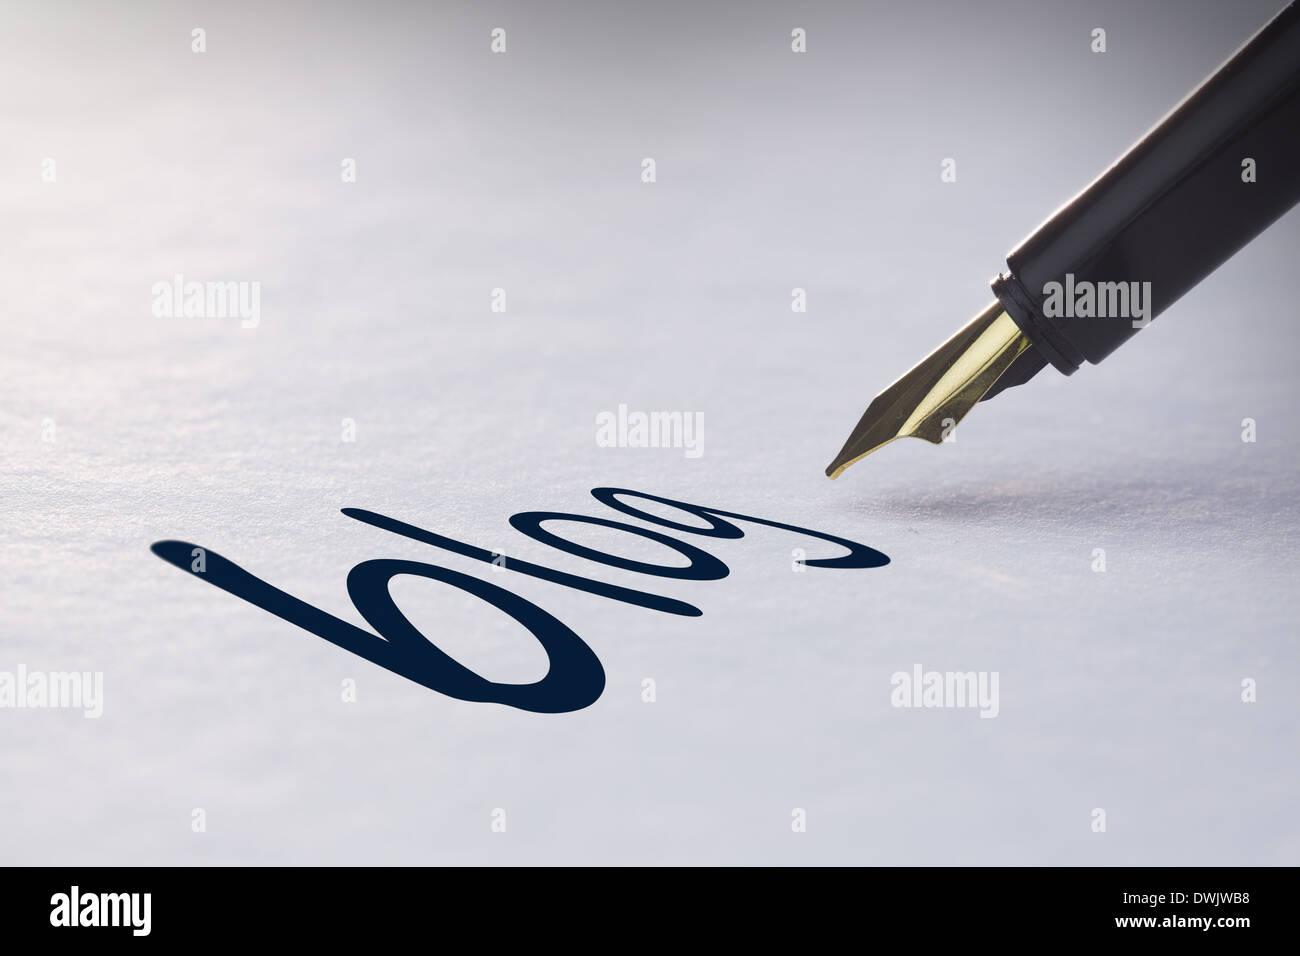 Fountain pen writing Blog - Stock Image